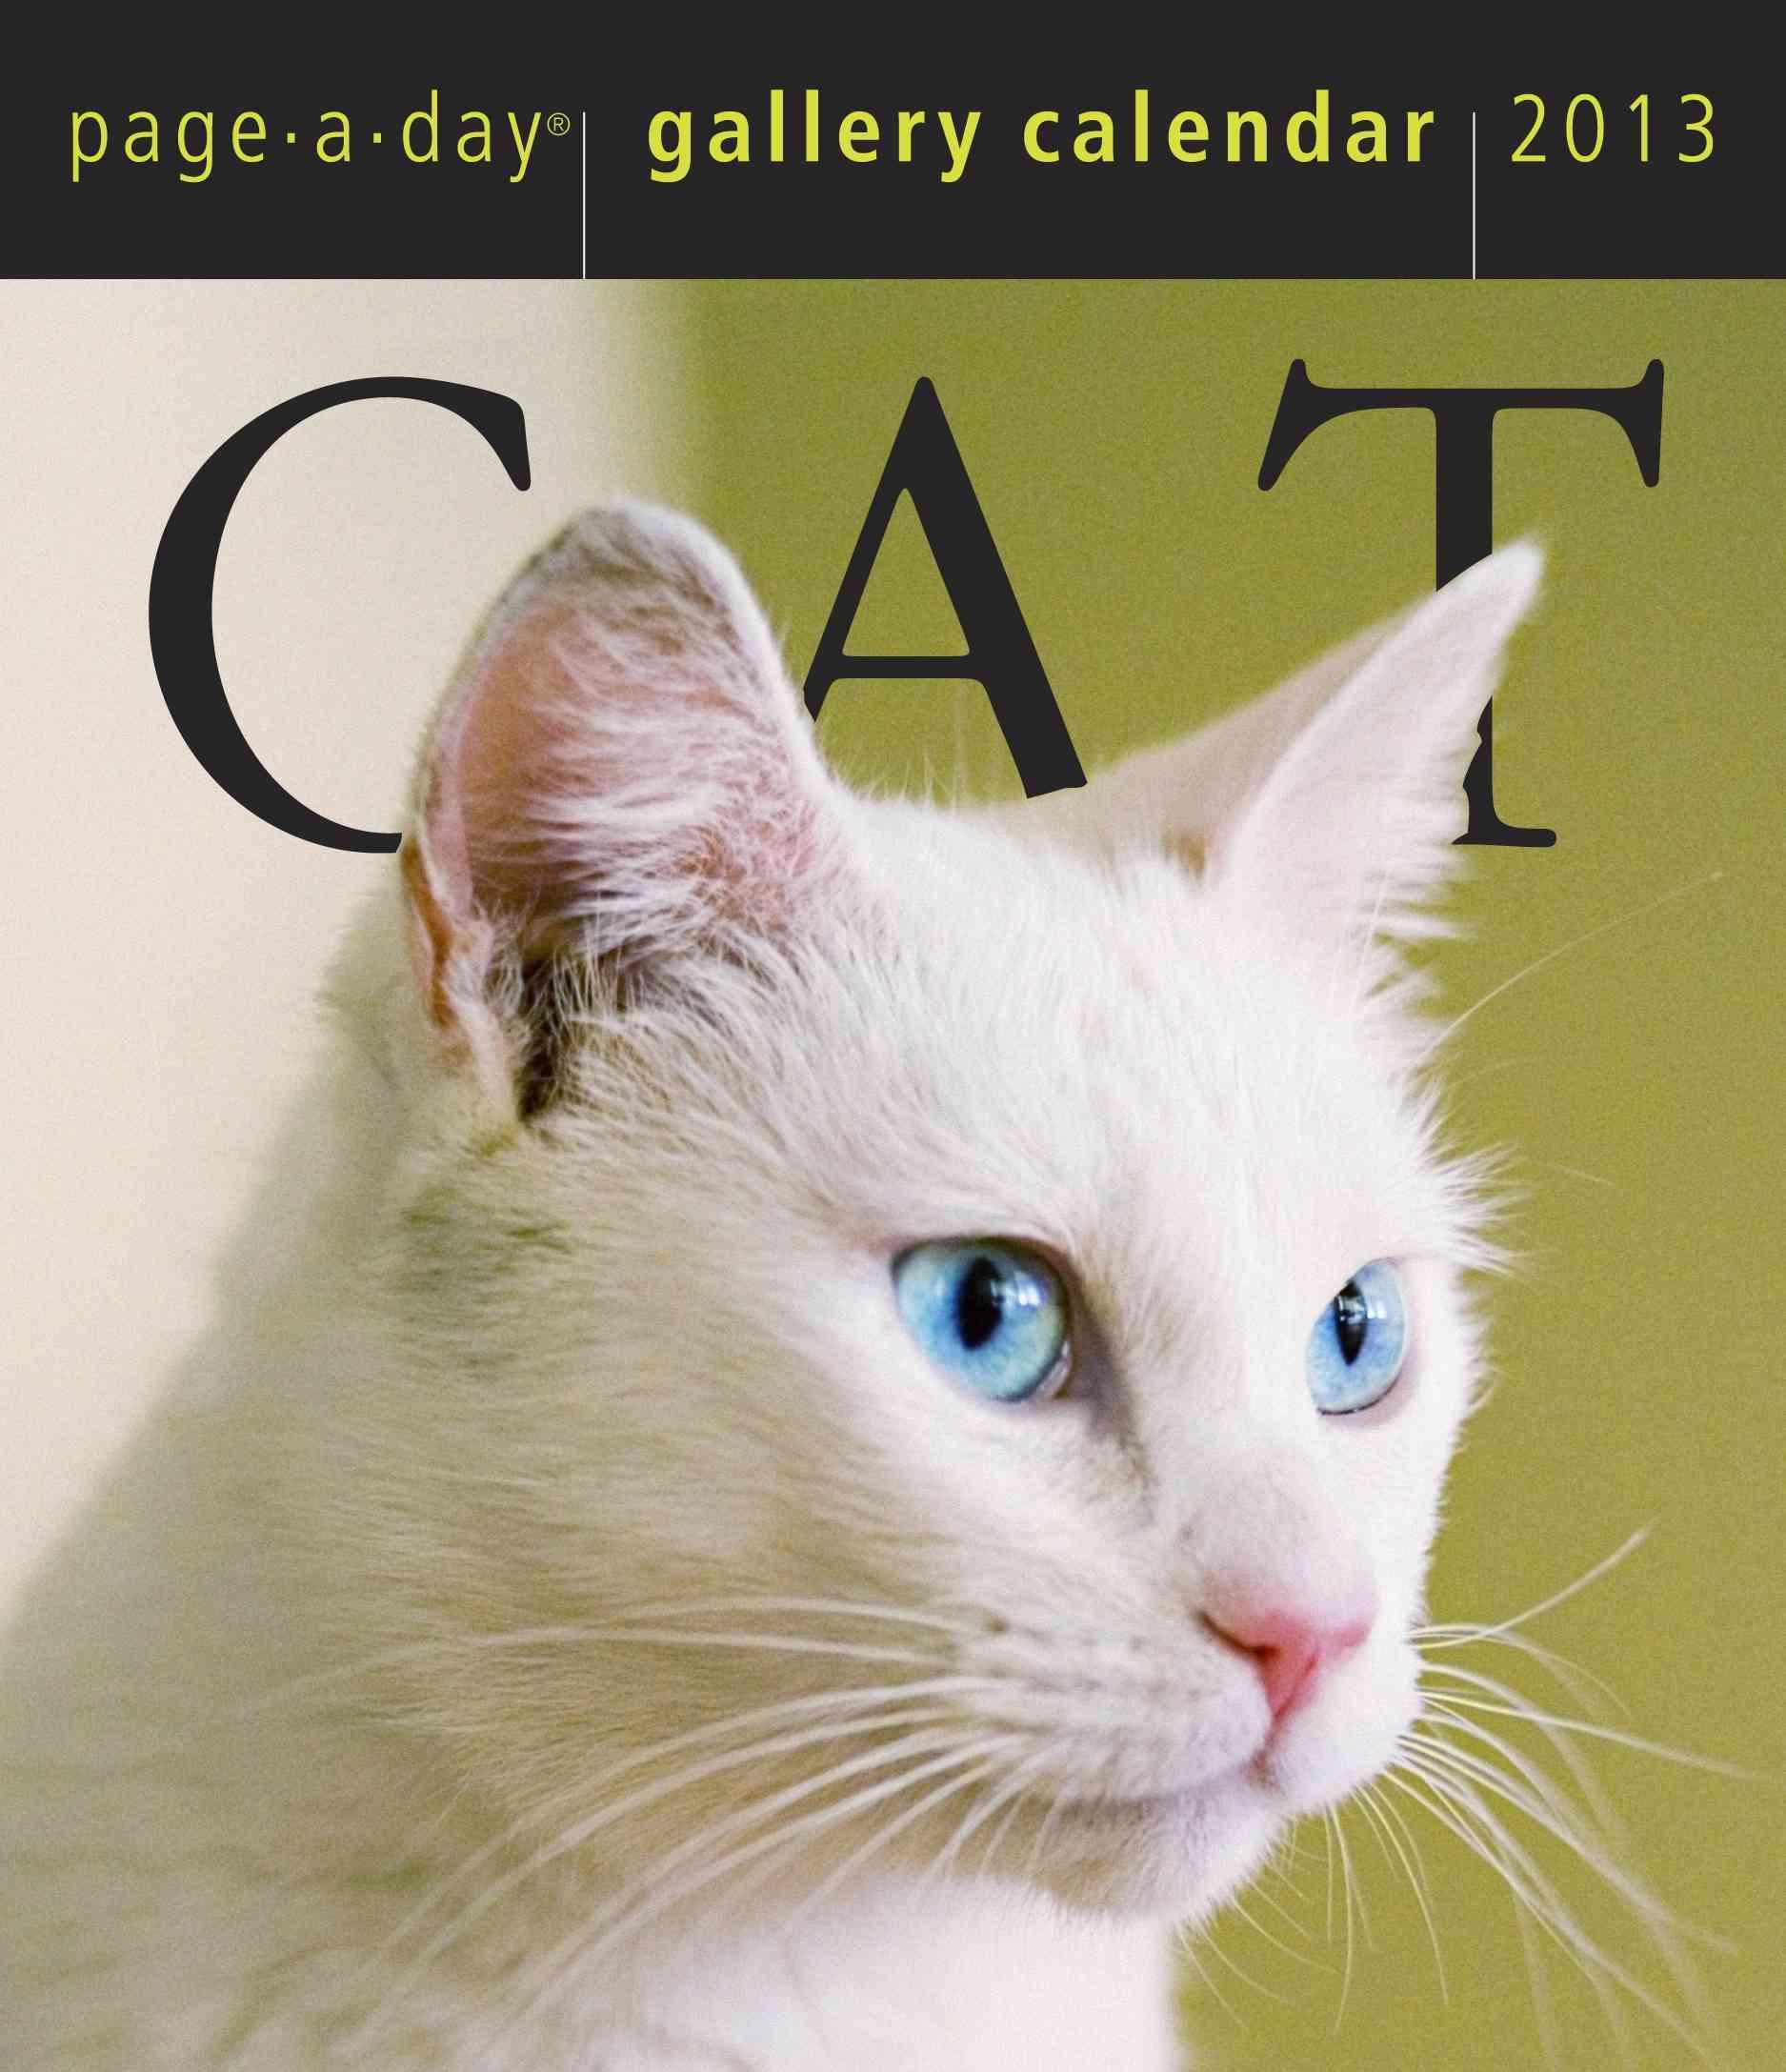 Cat Gallery 2013 Calendar